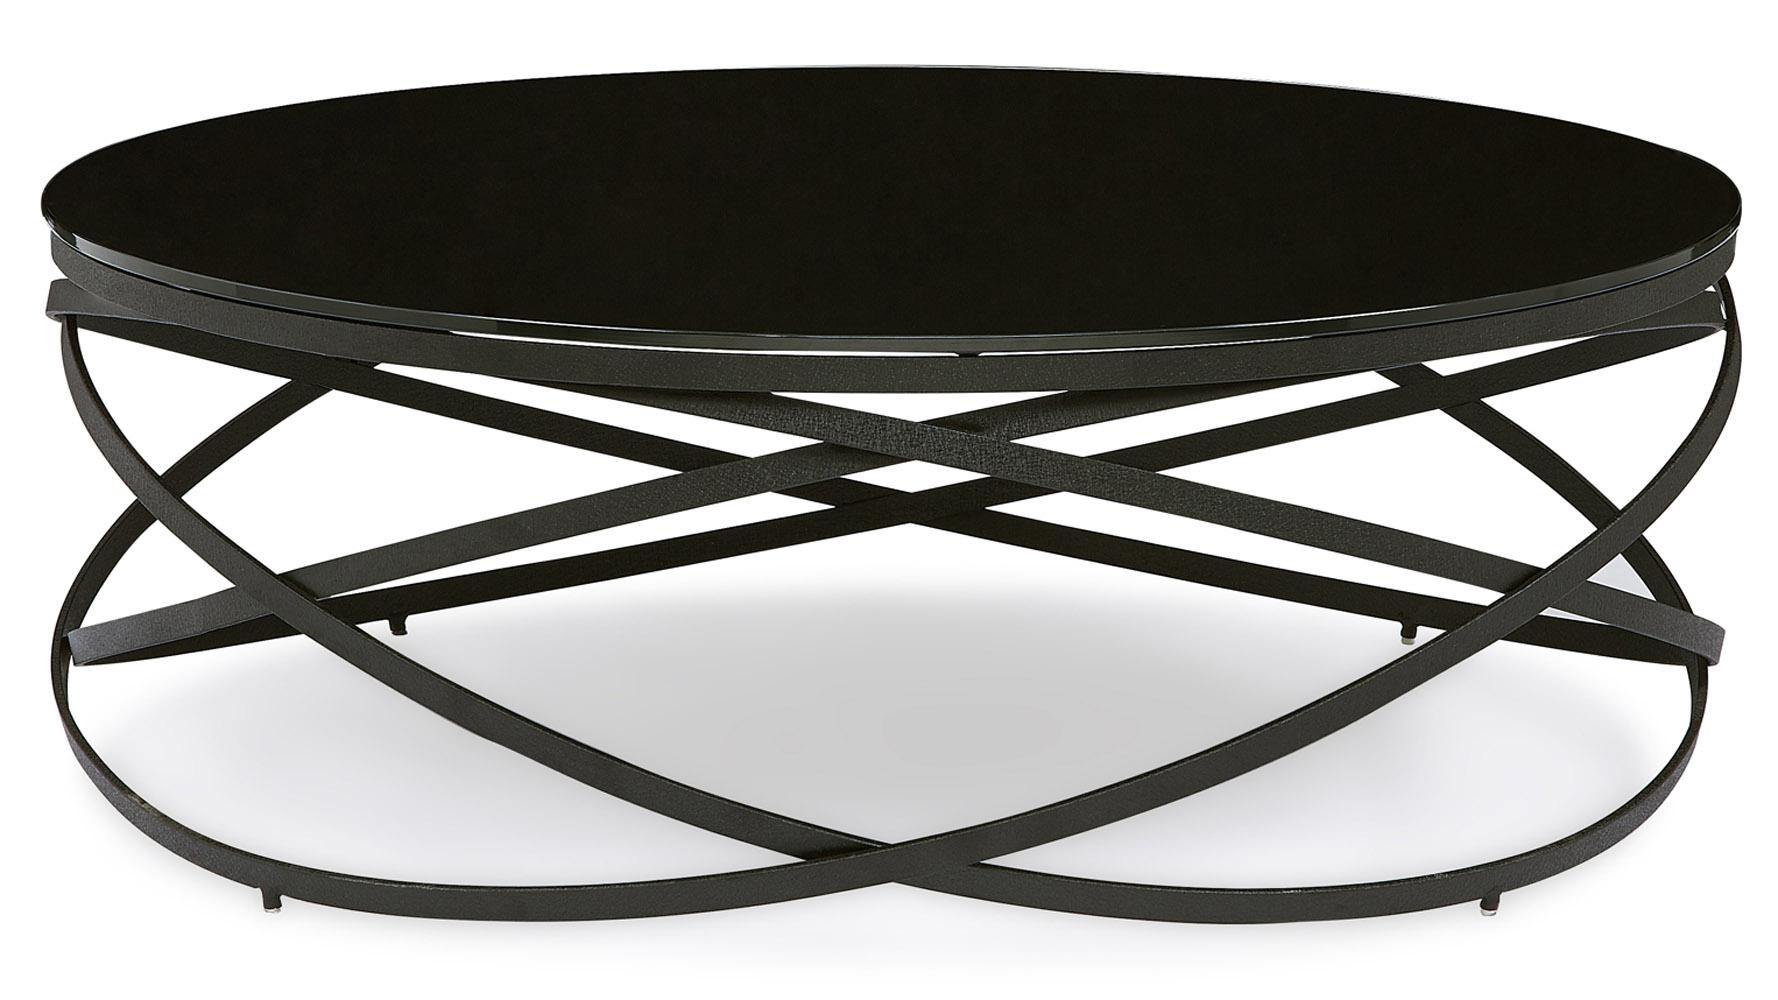 Black Glass Side Table Gumtree: Zinta Coffee Table Black Glass